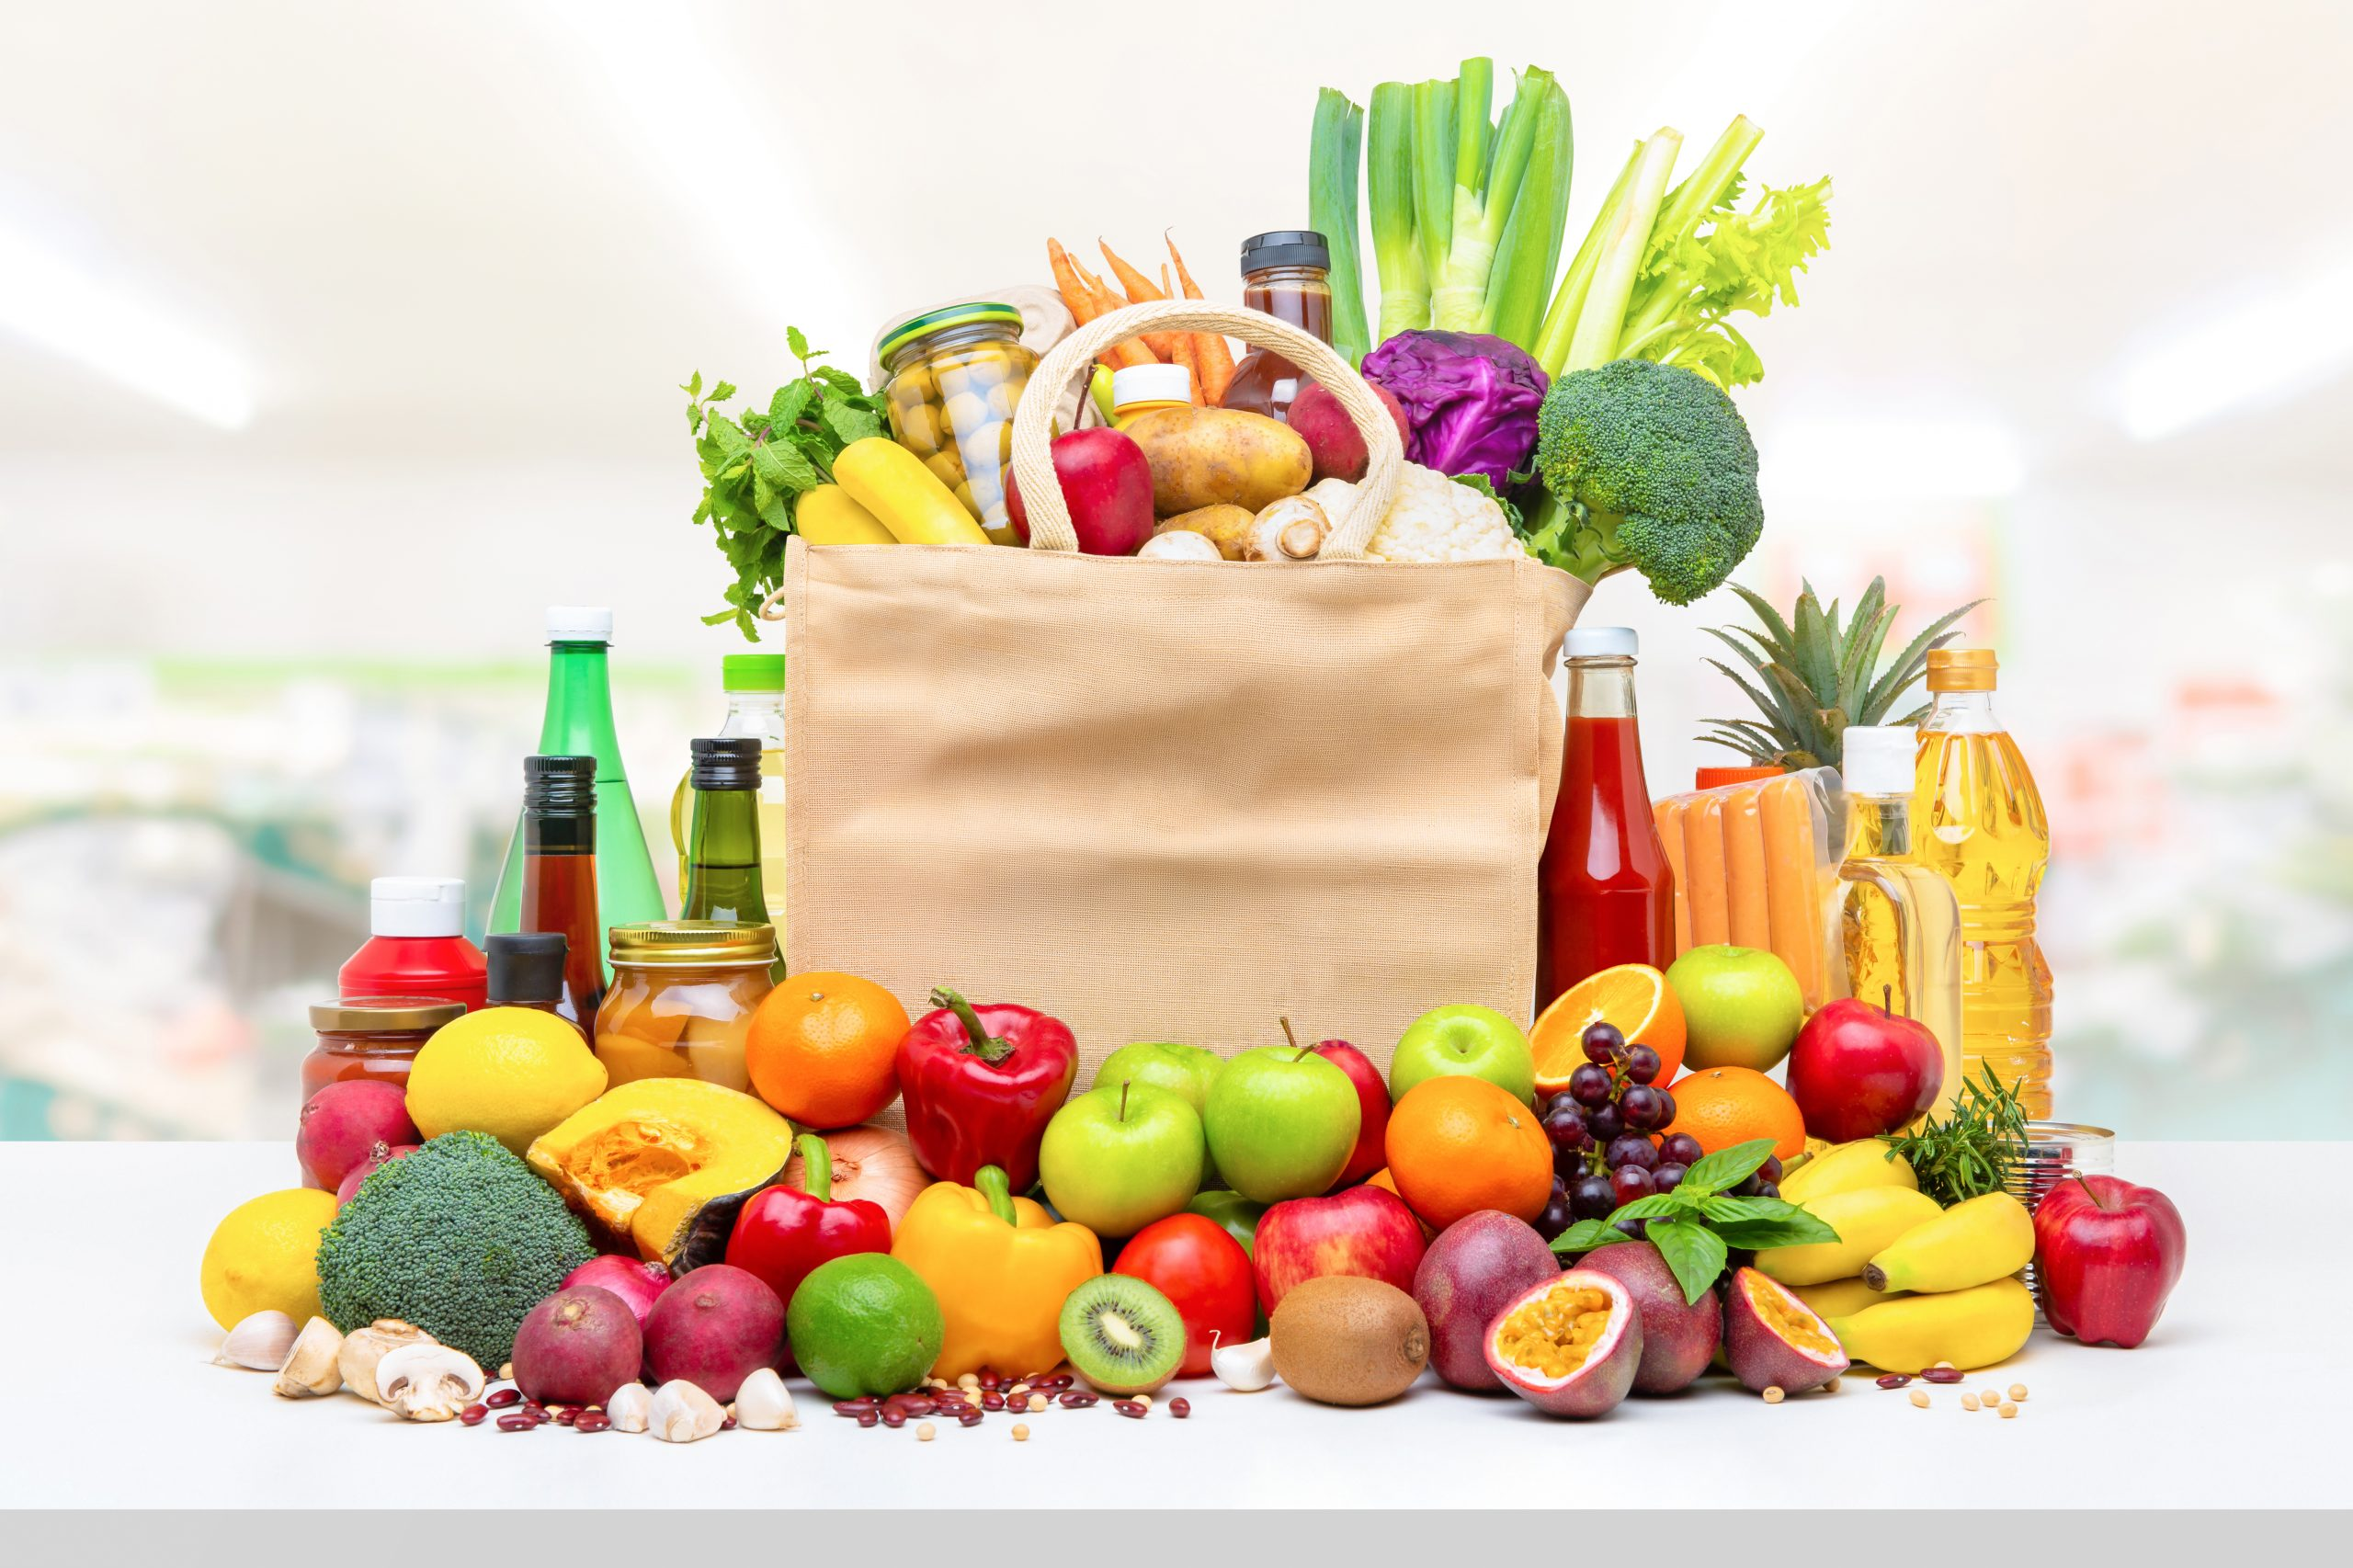 RepUPMag_5-consigli-sprecare-meno-cibo.jpg